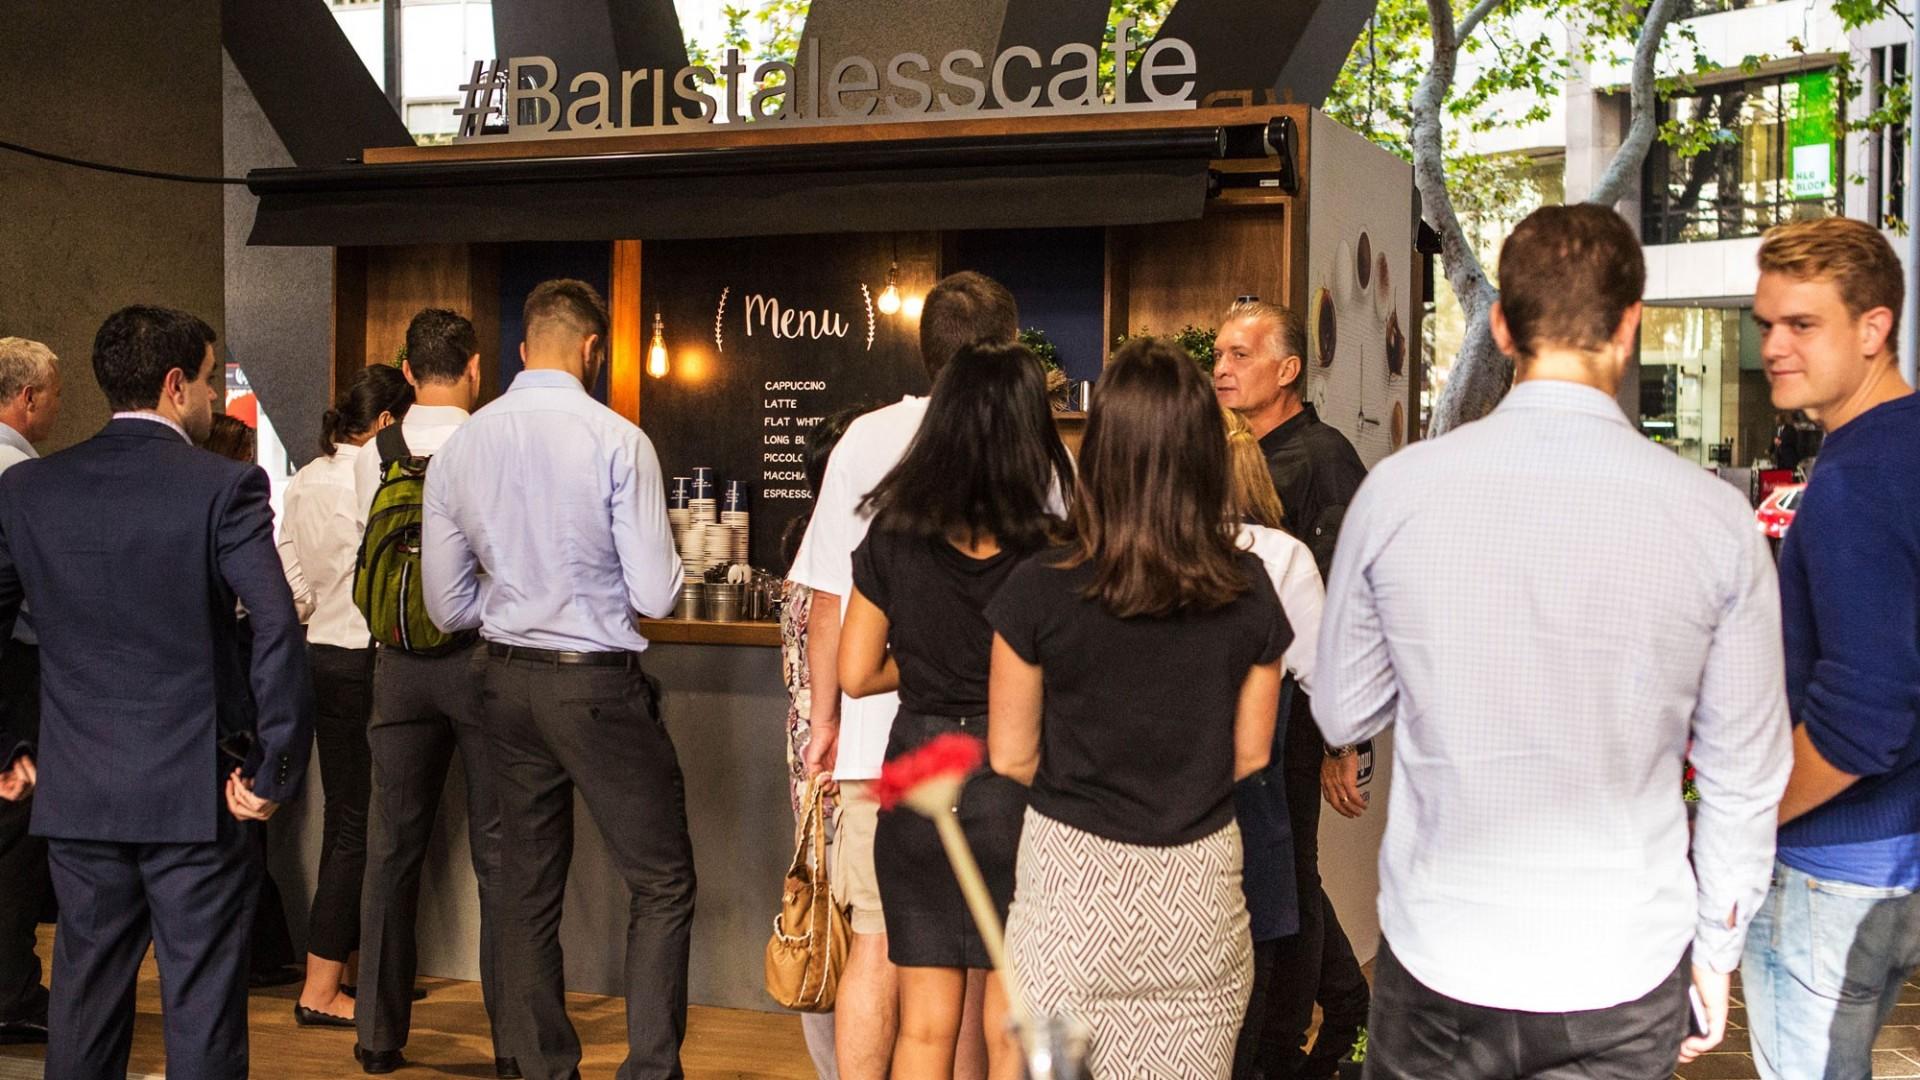 The Barista-less Cafe queue 4